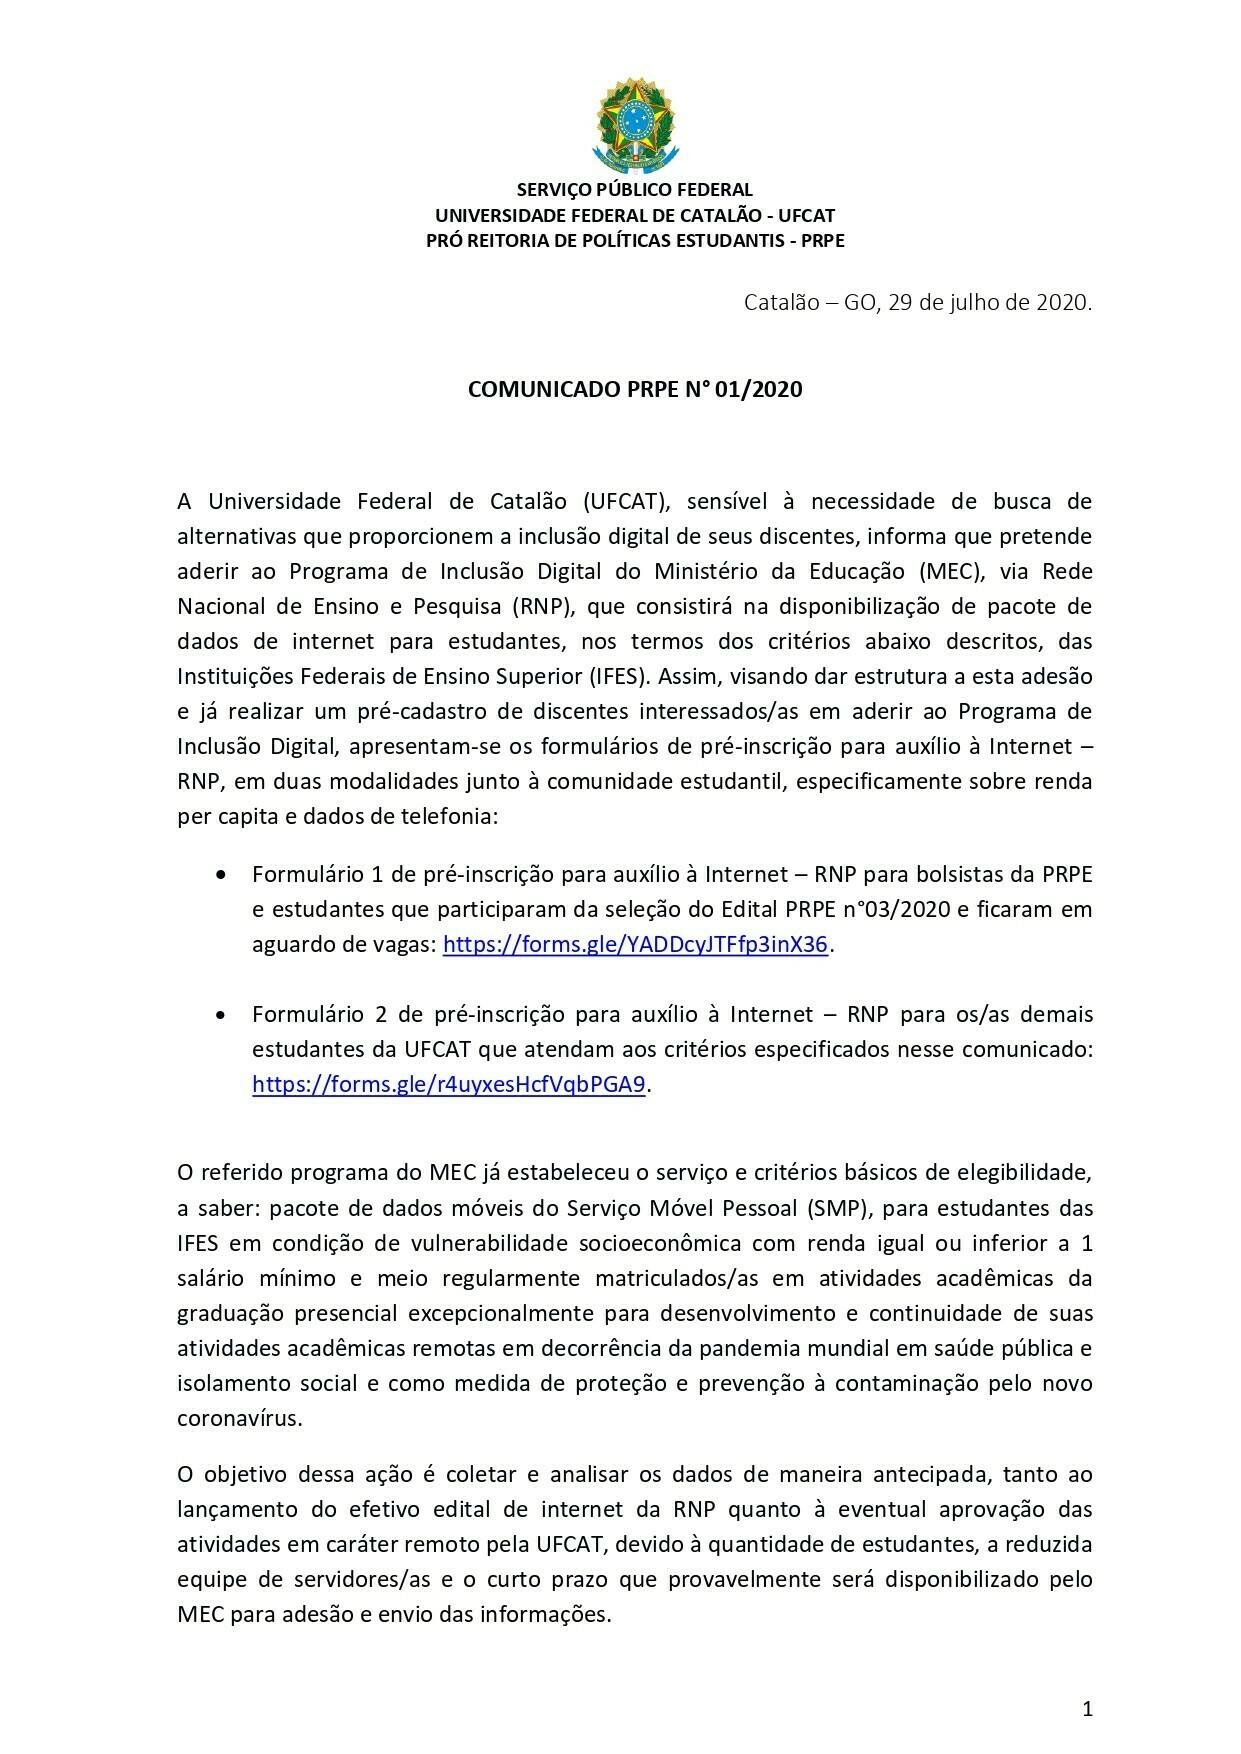 Comunicado pagina 2